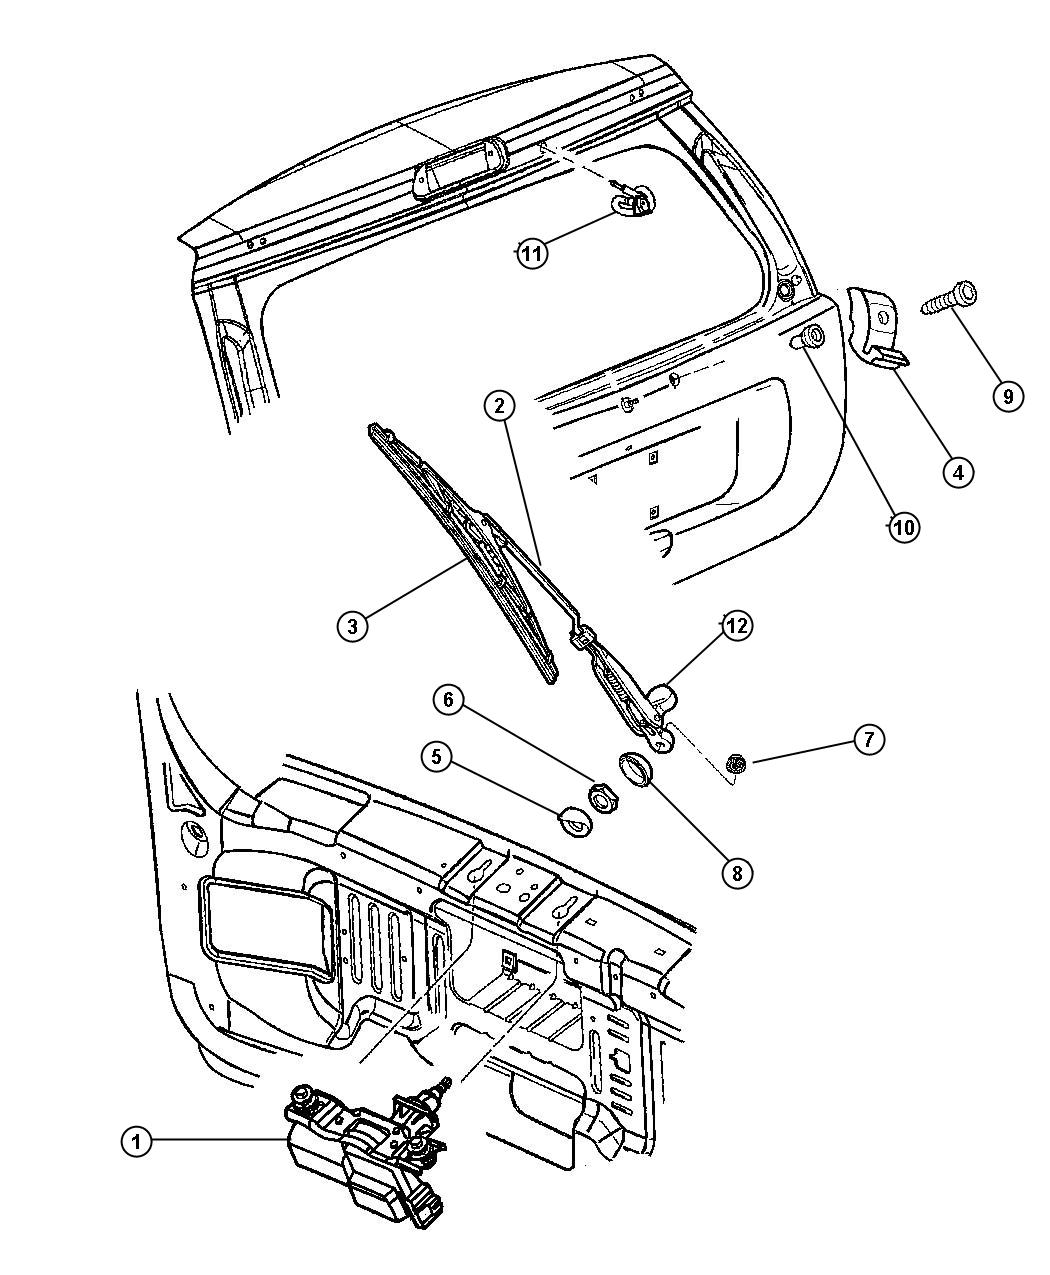 Jeep Liberty Cap Cover Rear Wiper Arm Rear Wiper Motor